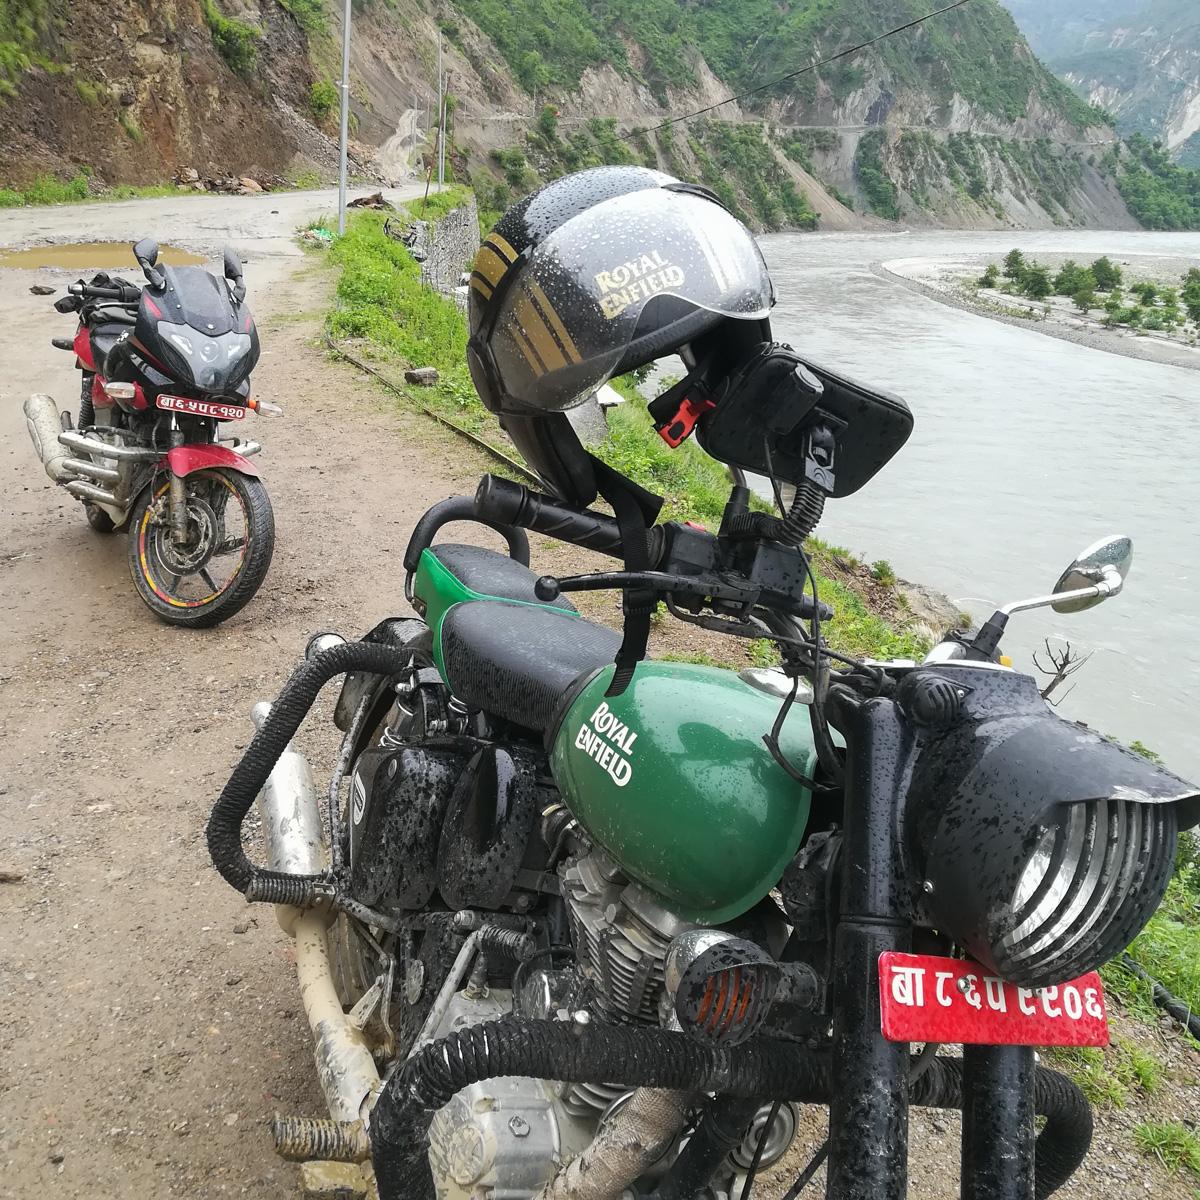 Back to Kathmandu, Everest 3 pass #4 32